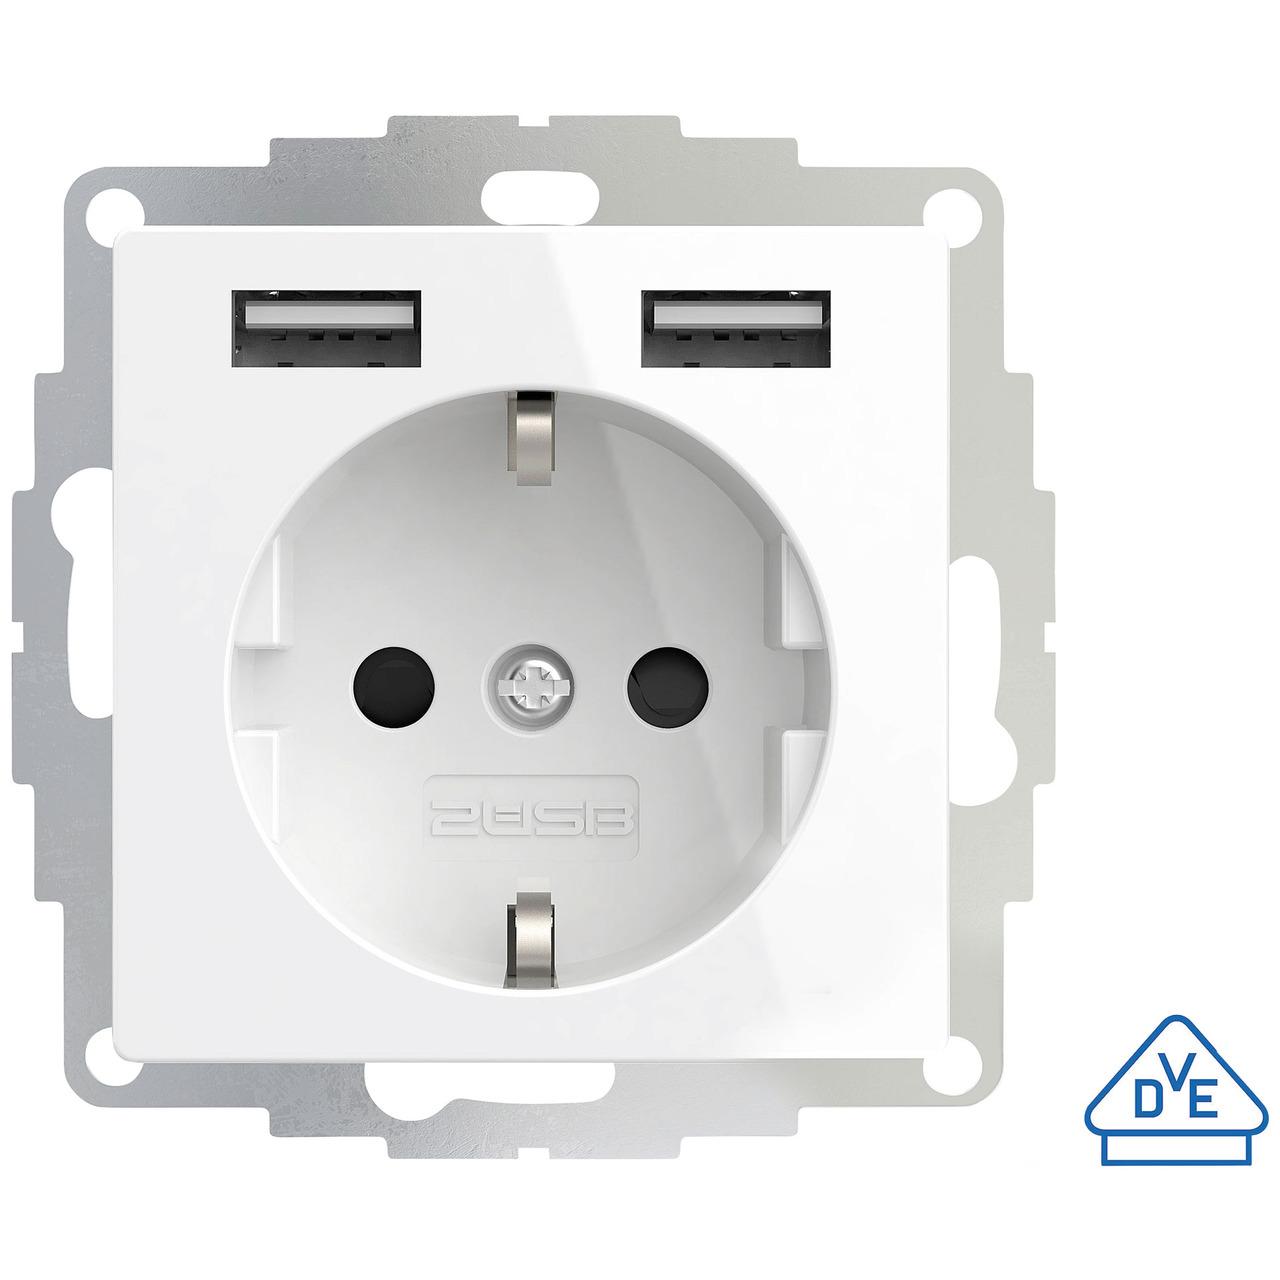 2USB Schutzkontakt-Steckdose mit 2 USB-Ports- reinweiss glänzend- 55 x 55 mm- VDE zertifiziert